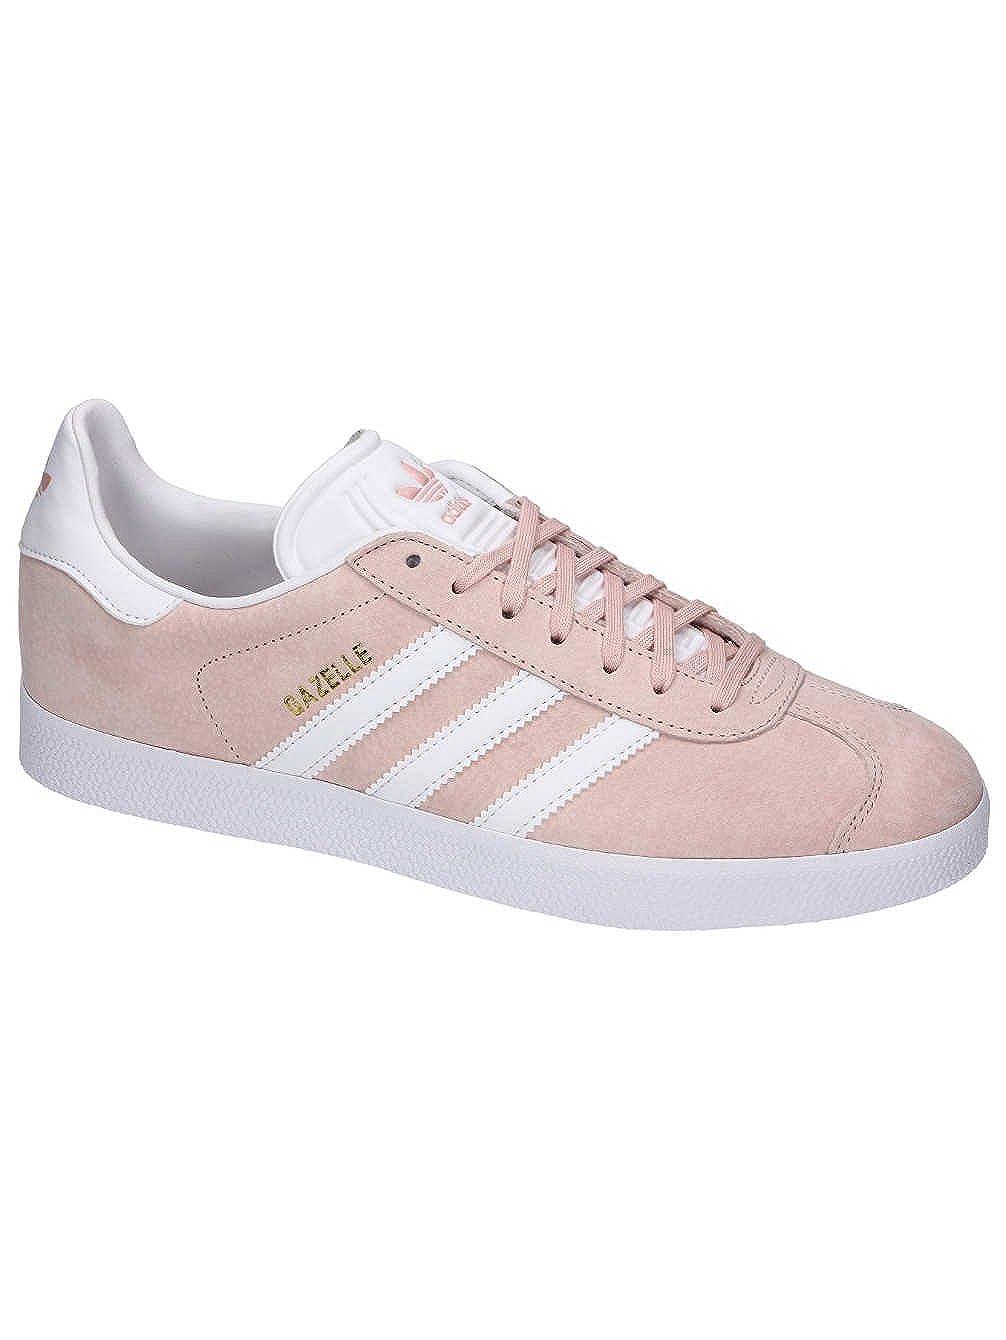 Adidas - - - Gazelle, Scarpe da Ginnastica Unisex Adulto | Forma elegante  | Uomini/Donne Scarpa  c2d27e